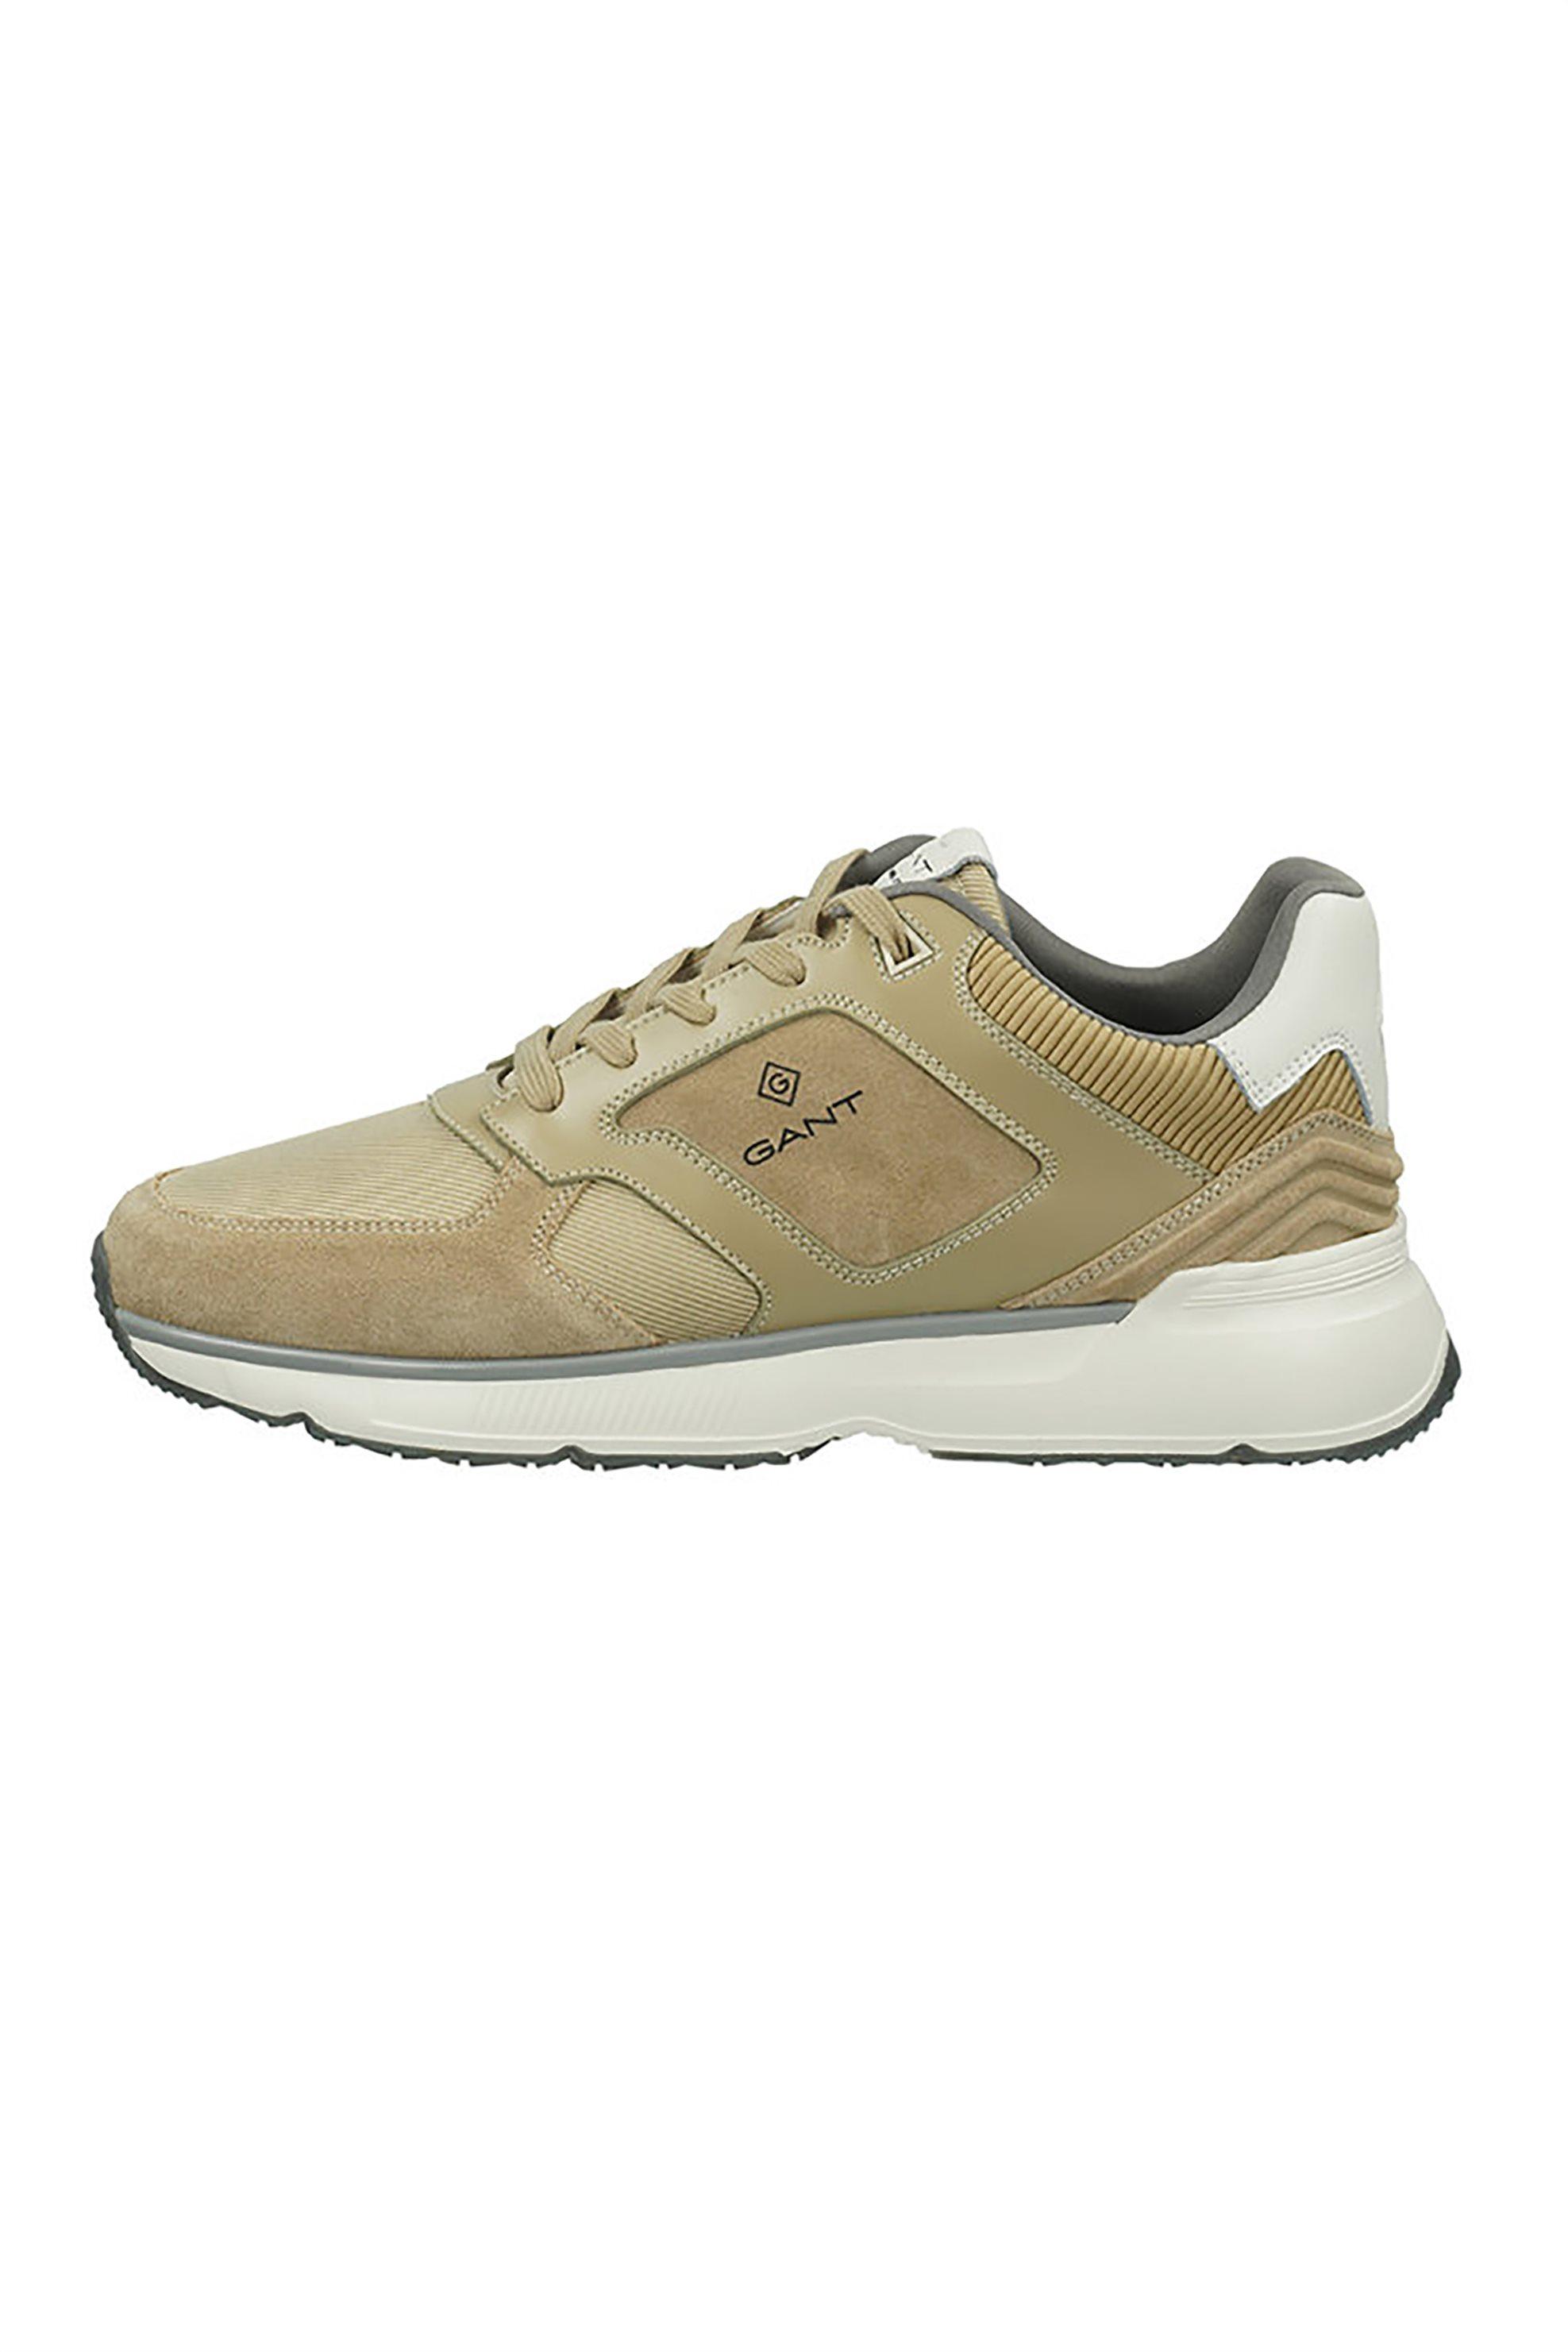 "Gant ανδρικά sneakers με logo print και suede λεπτομέρειες ""Beeker"" – 22633622 – Μπεζ"